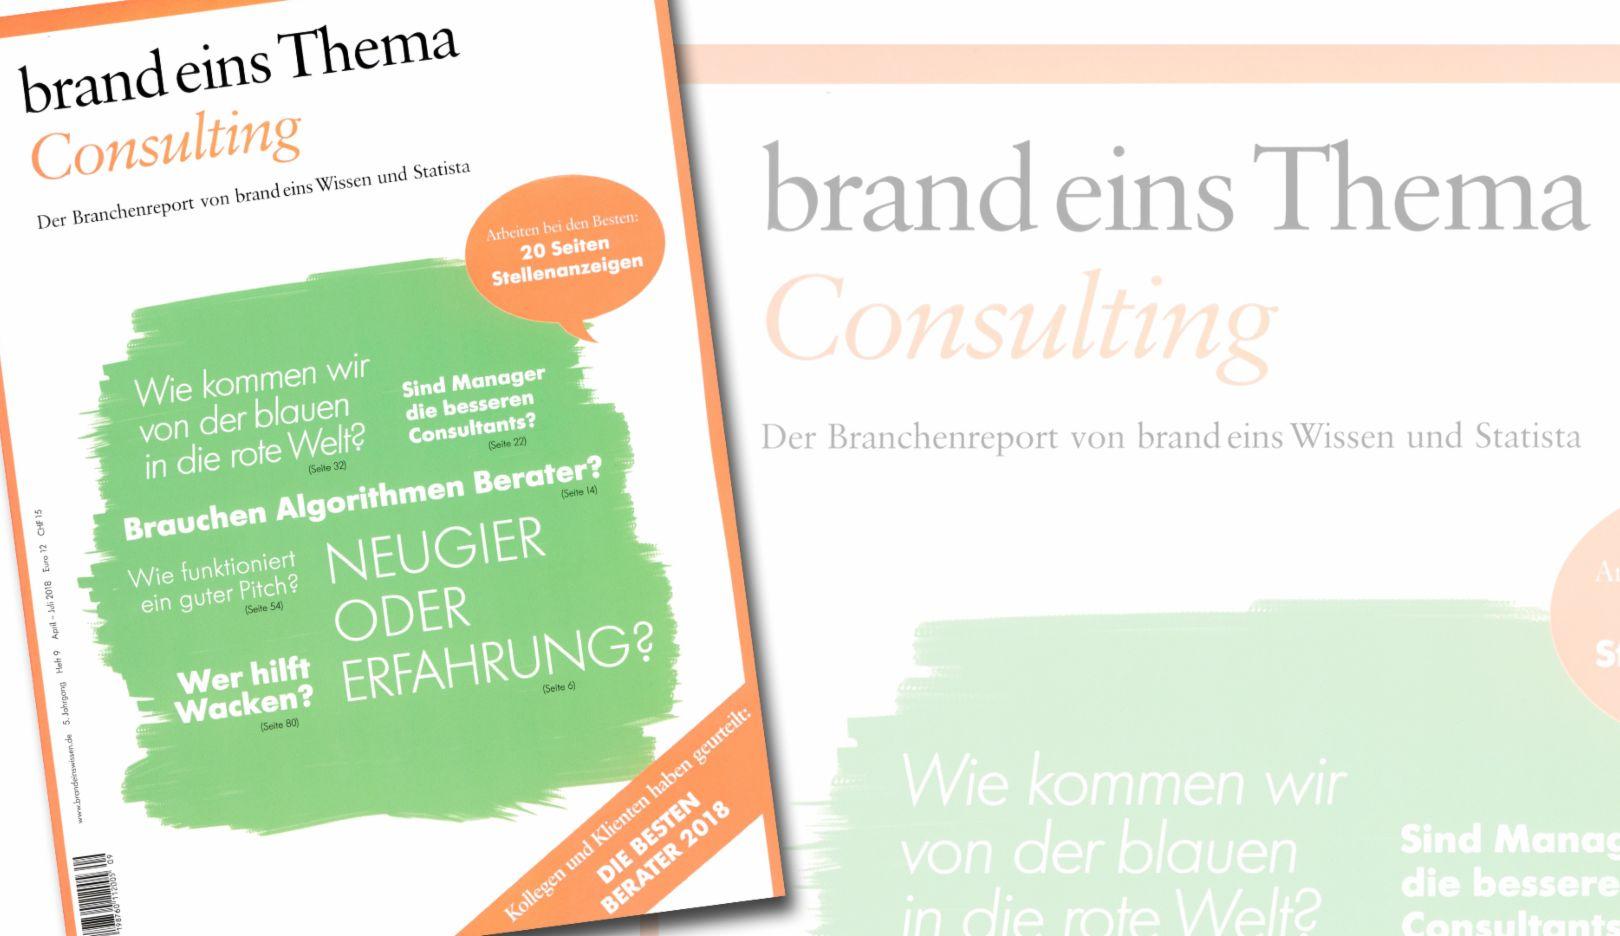 brand eins Thema Consulting, 2018, Porsche Consulting GmbH